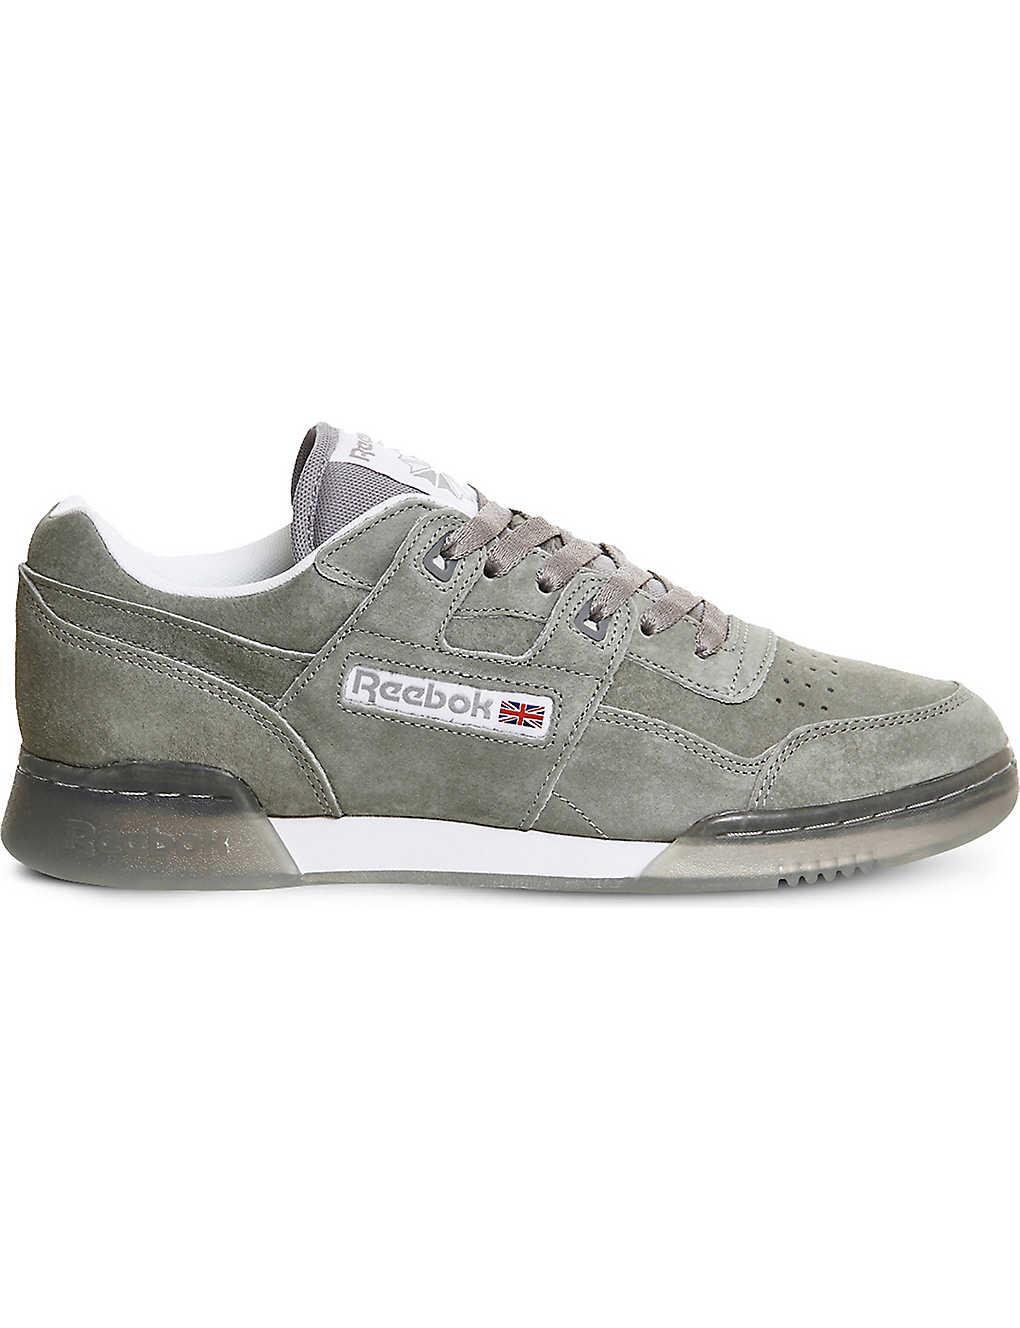 80d36d5391c6cd REEBOK - Workout Plus suede sneakers